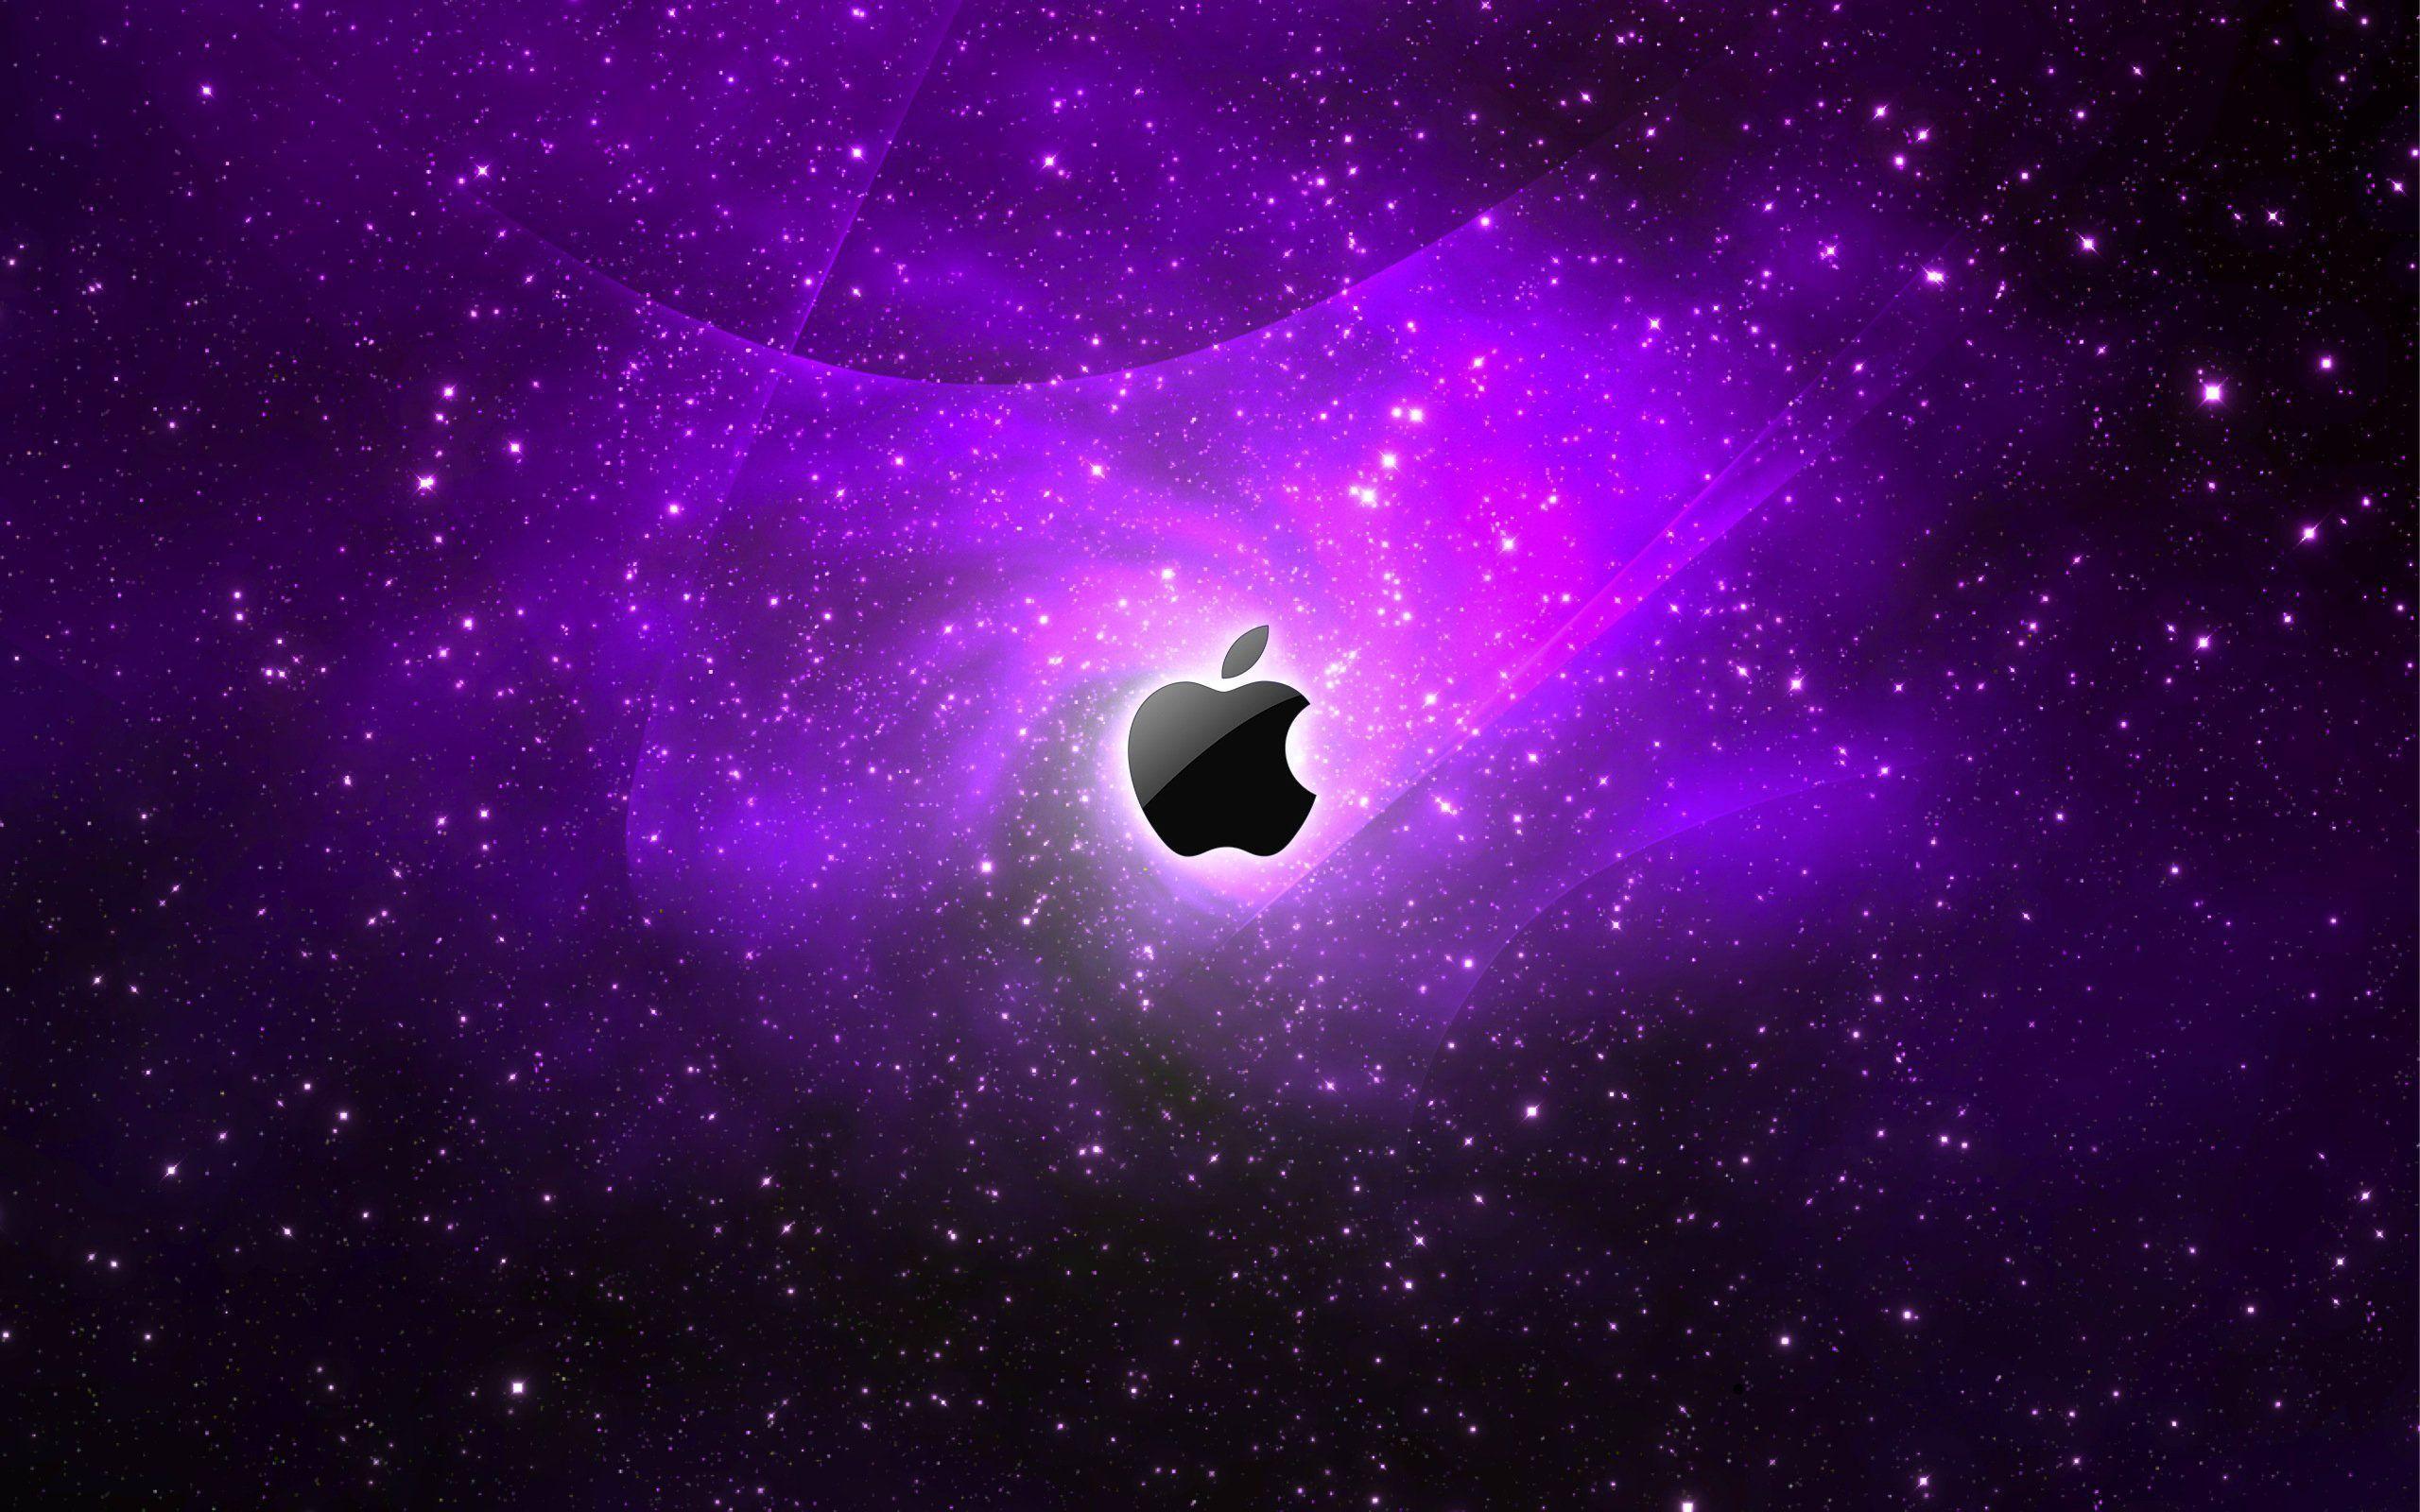 Galaxy Apple Logo Wallpapers Top Free Galaxy Apple Logo Backgrounds Wallpaperaccess